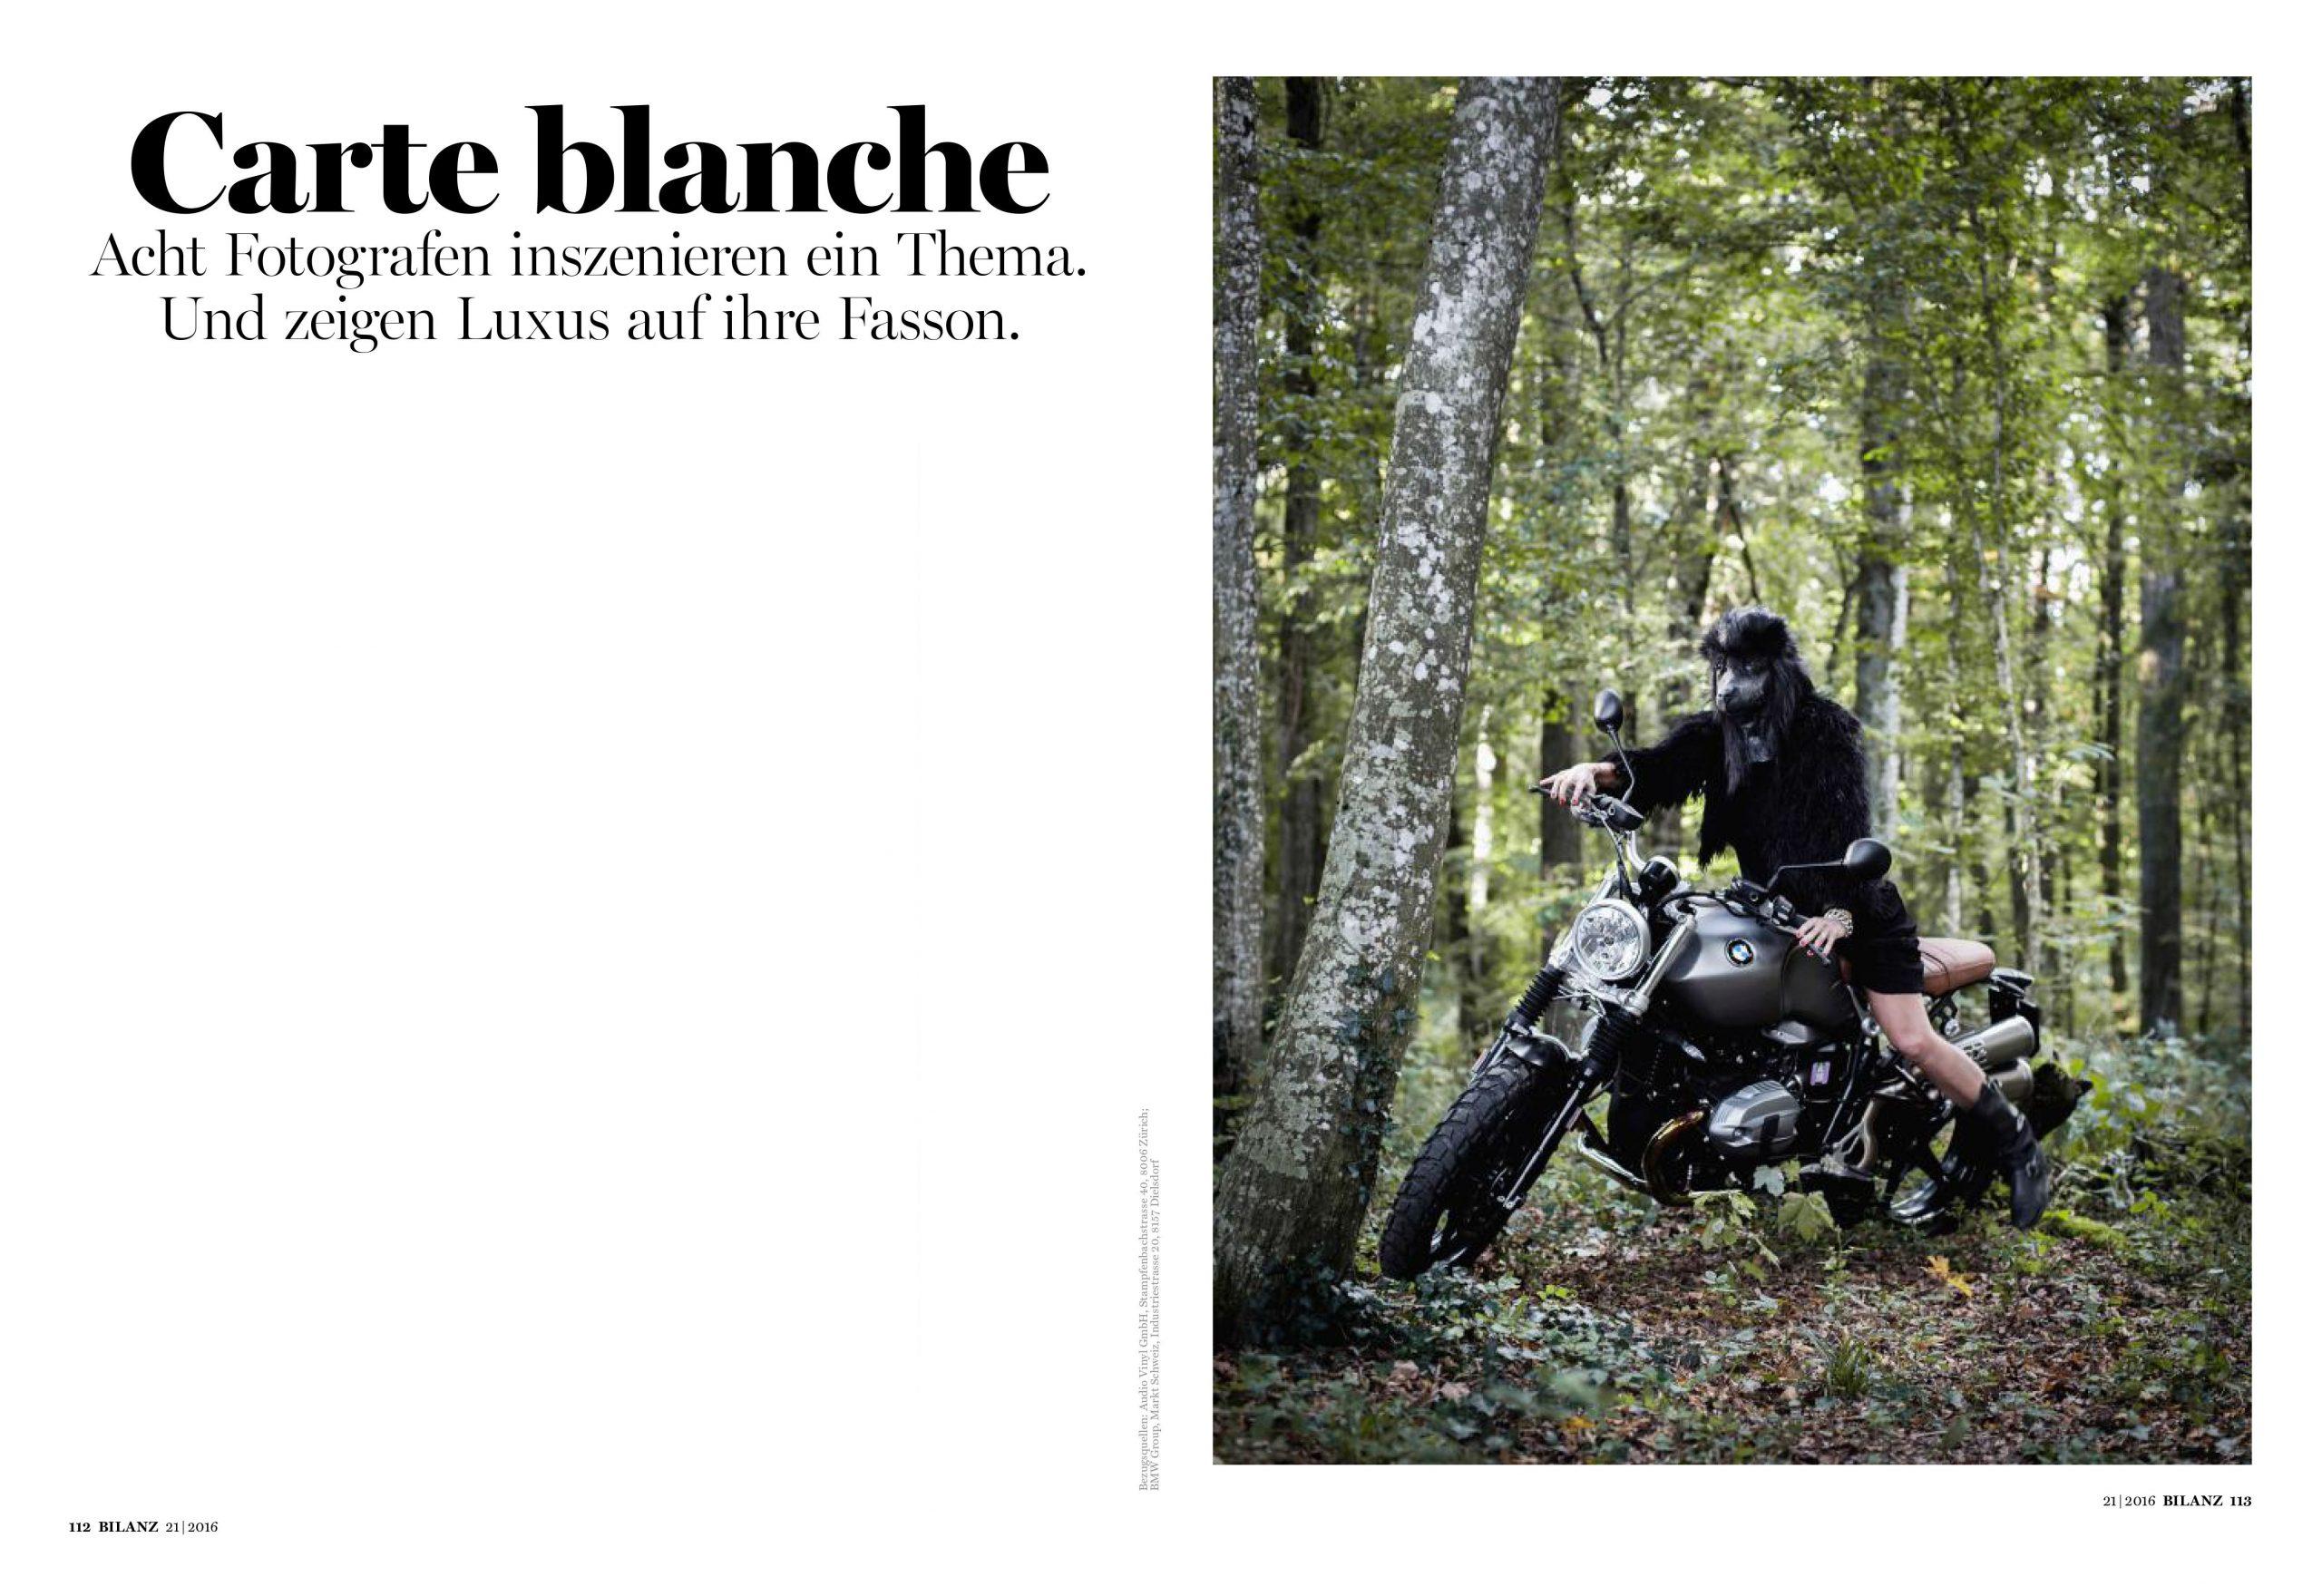 016_11_Bilanz_carte_blanche